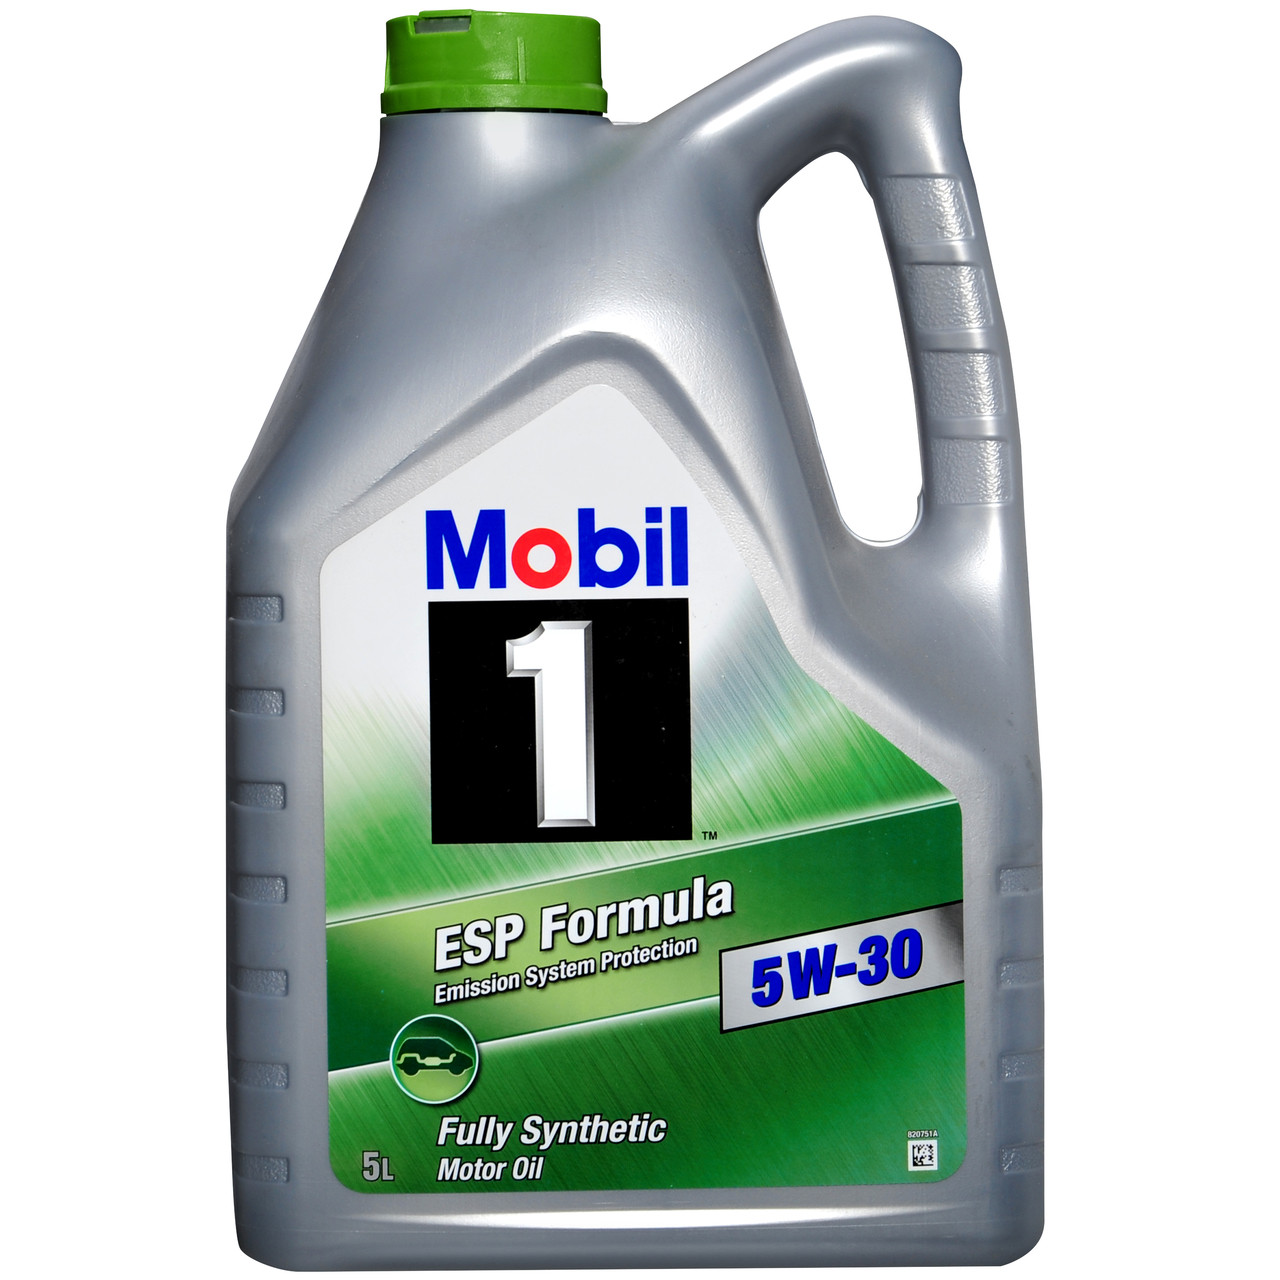 Mobil 1 esp formula 5w 30 5l yorum 5w30 5 litre atu.